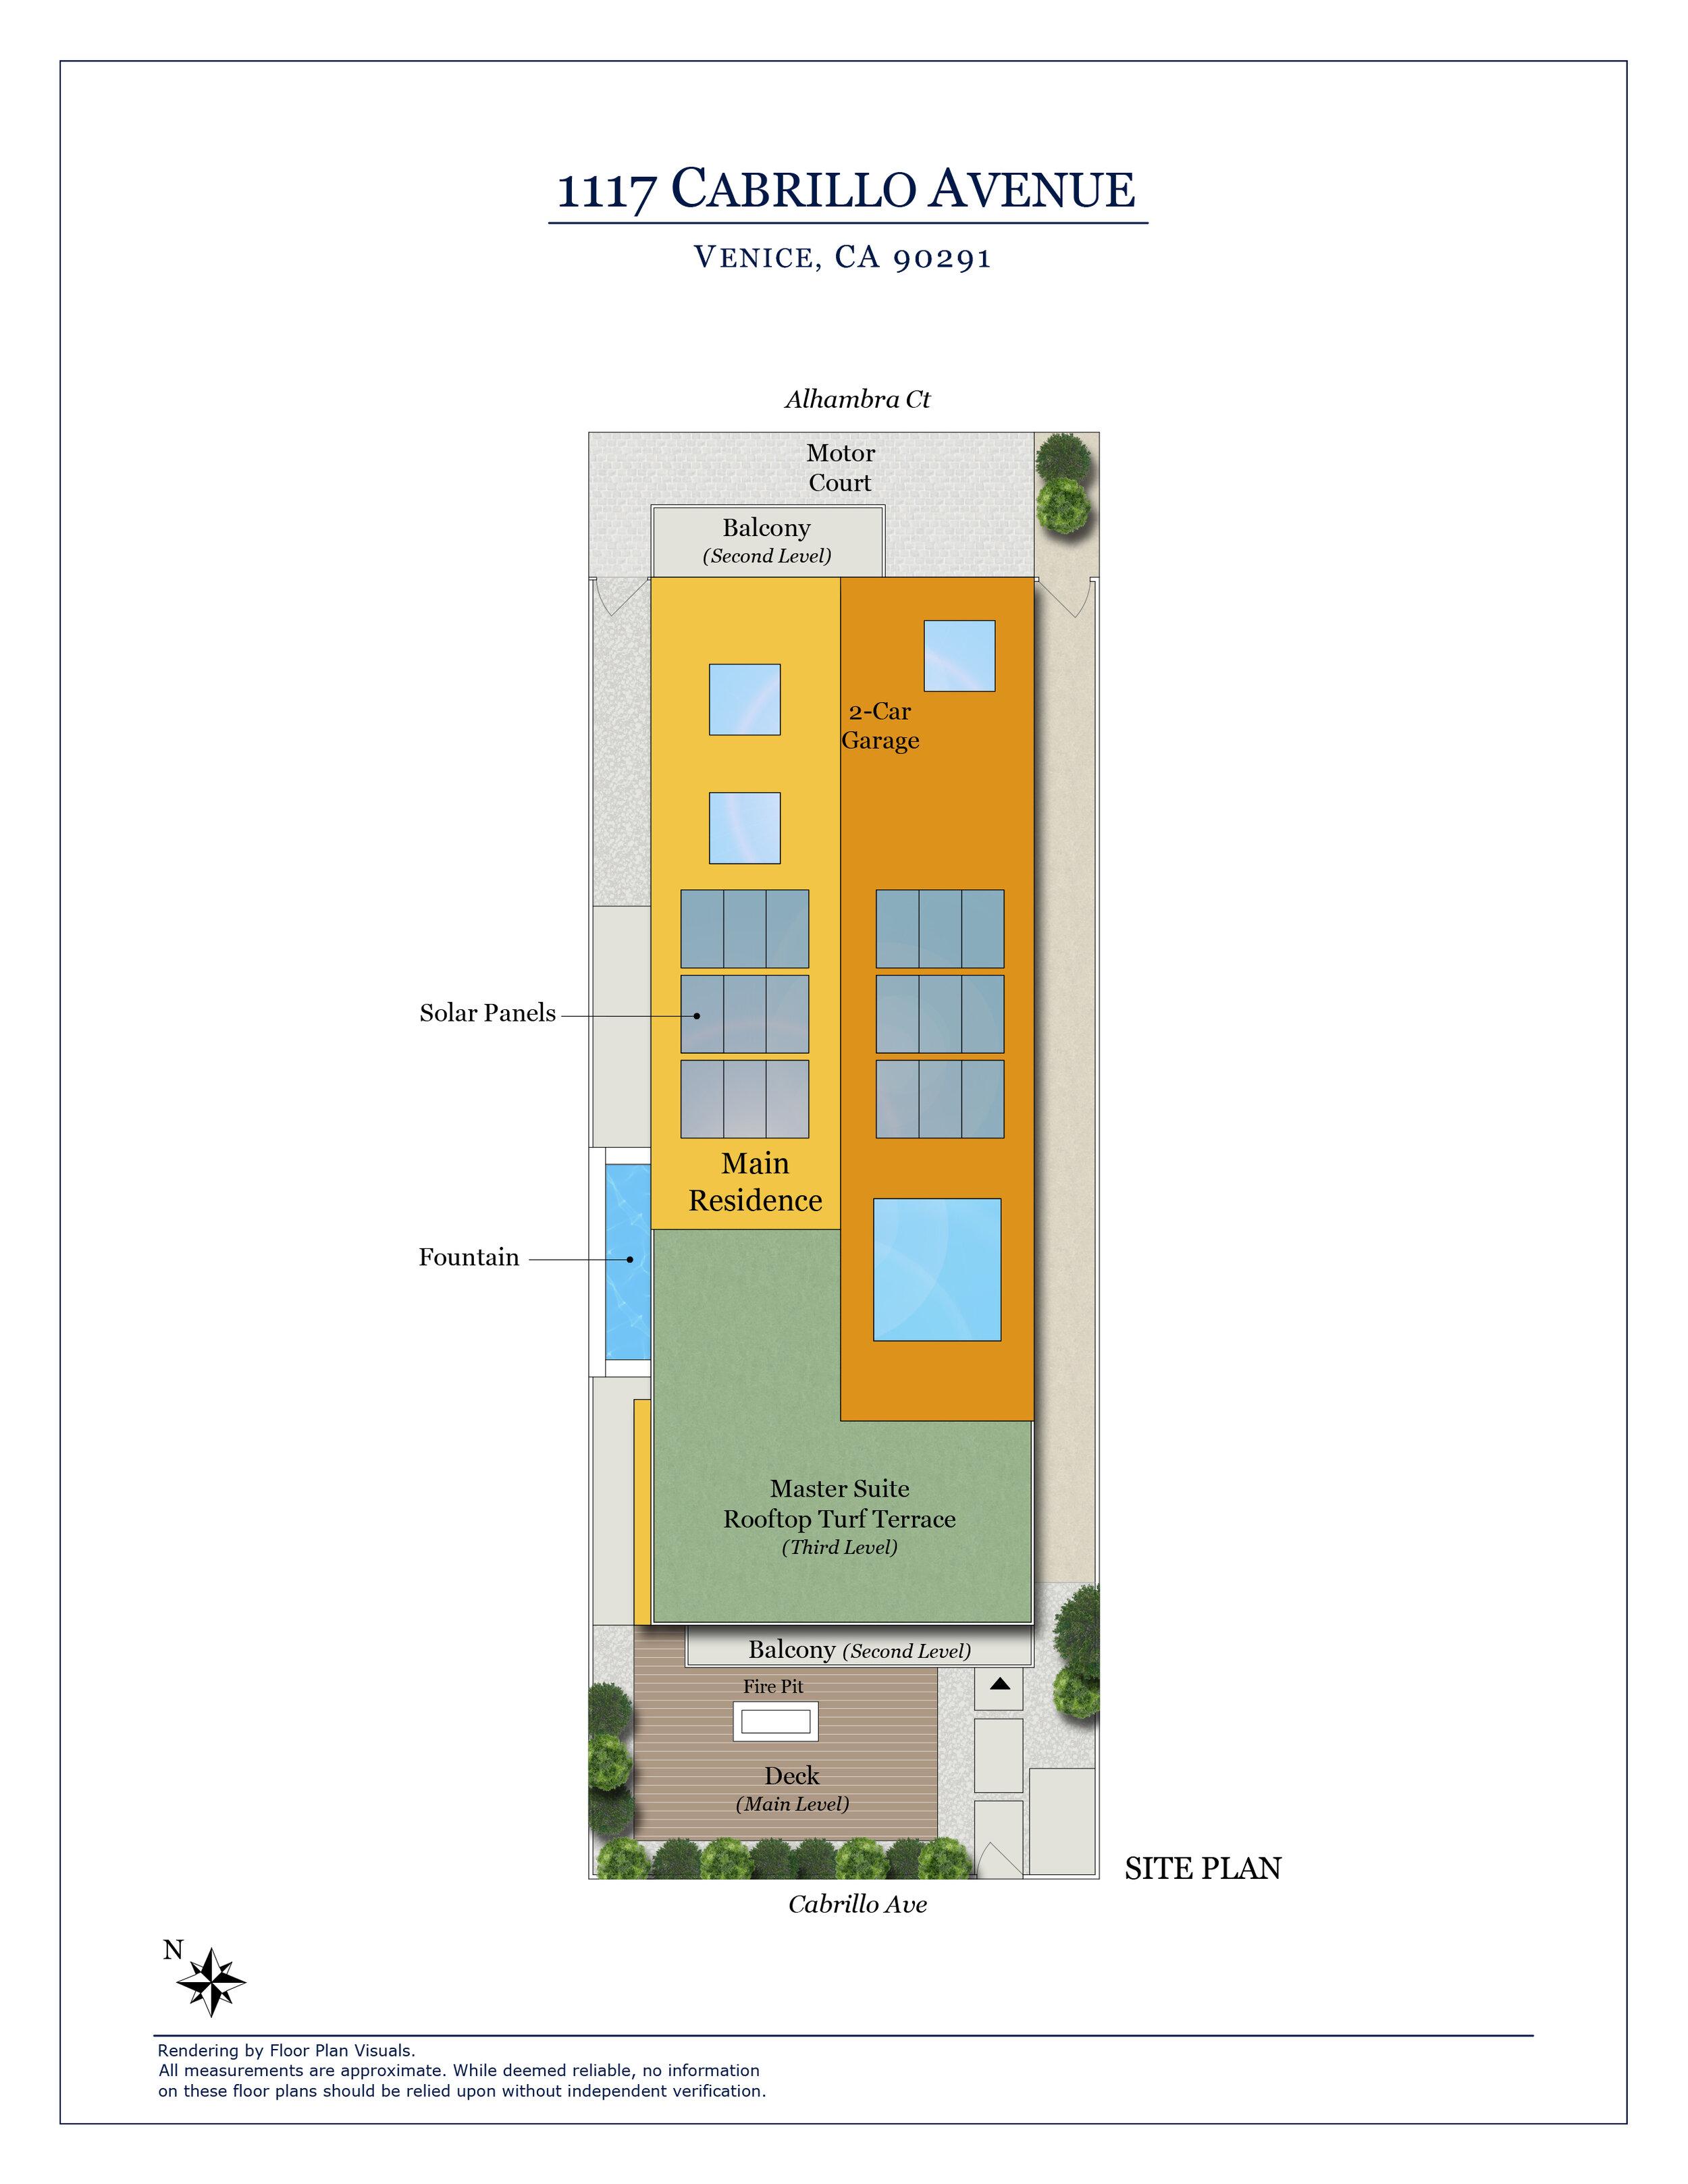 1117 Cabrillo Ave Site Plan.jpg